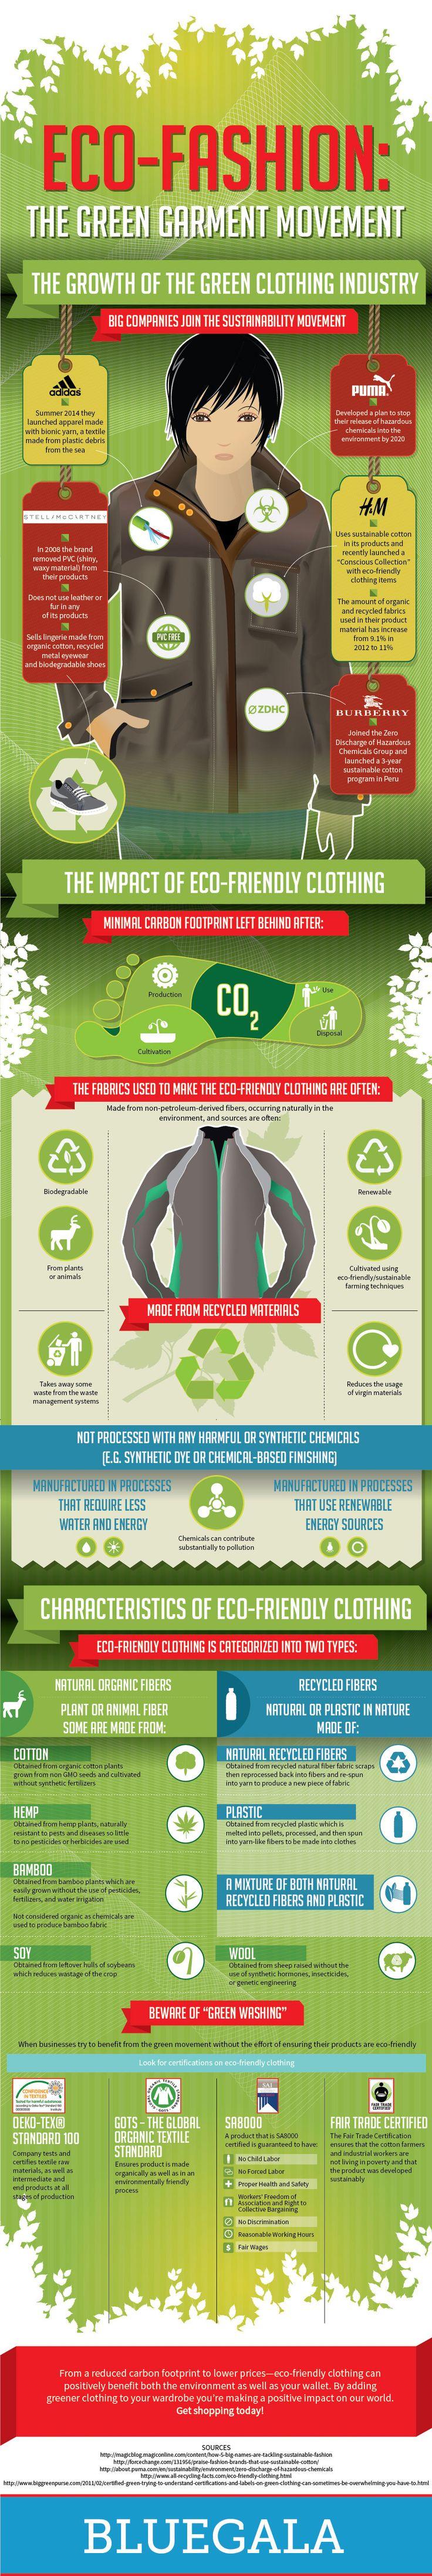 Eco-fashion [Infographic] | ecogreenlove